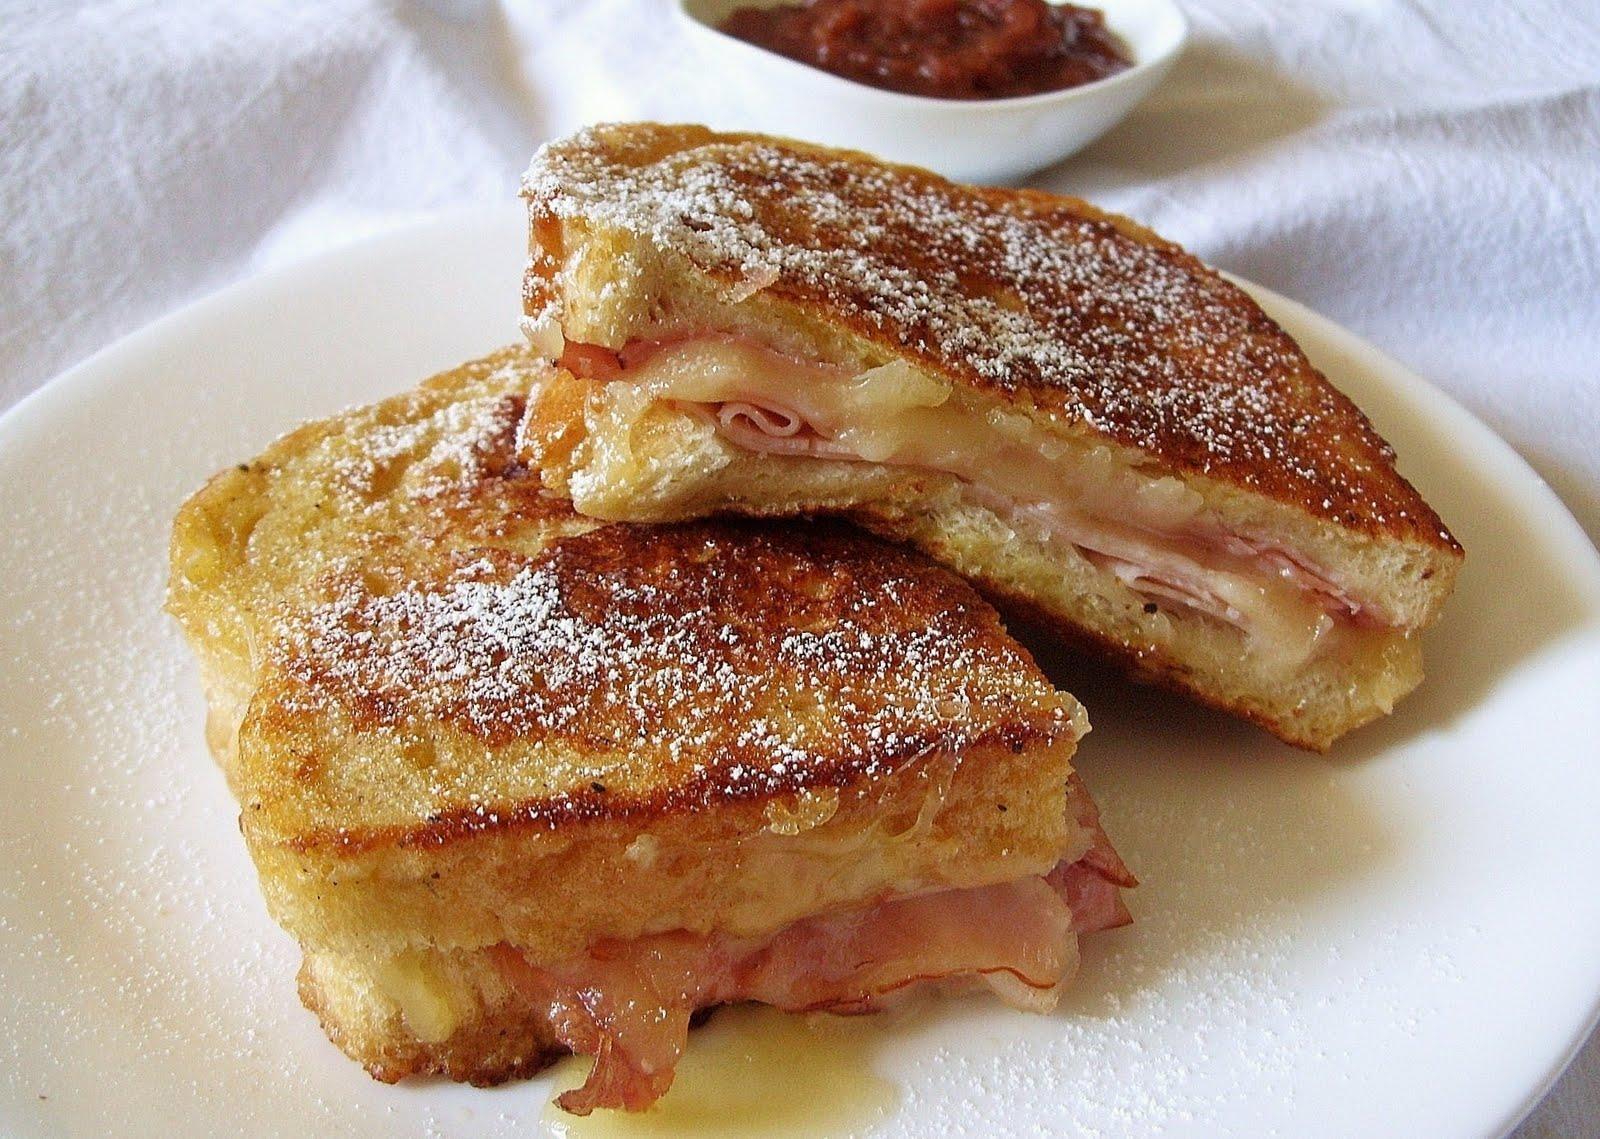 Sage Trifle: Monte Cristo Sandwich